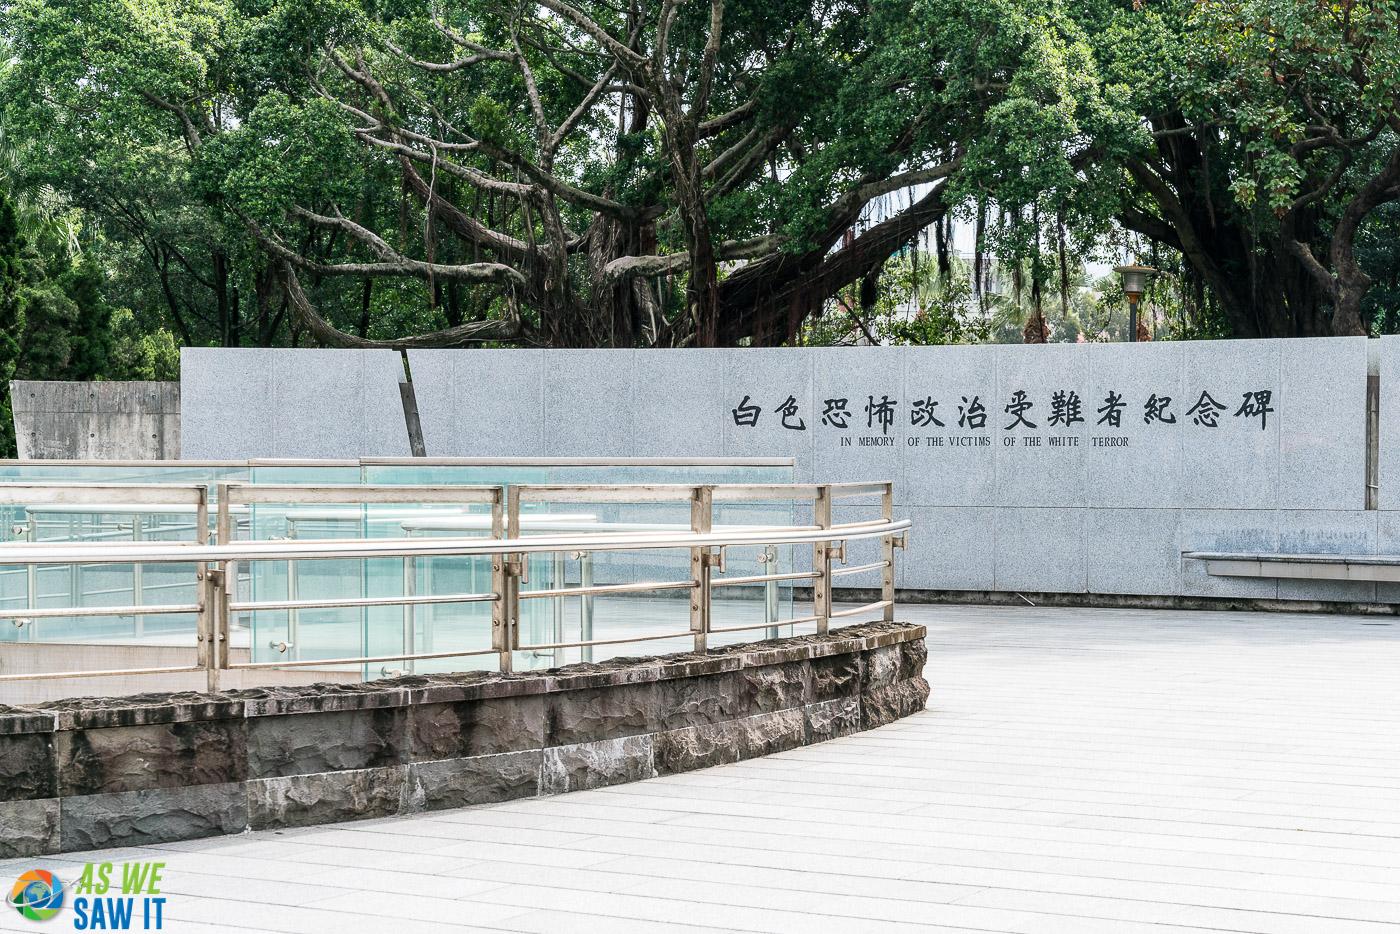 Memorial to Victims of the White Terror, Taipei, Taiwan